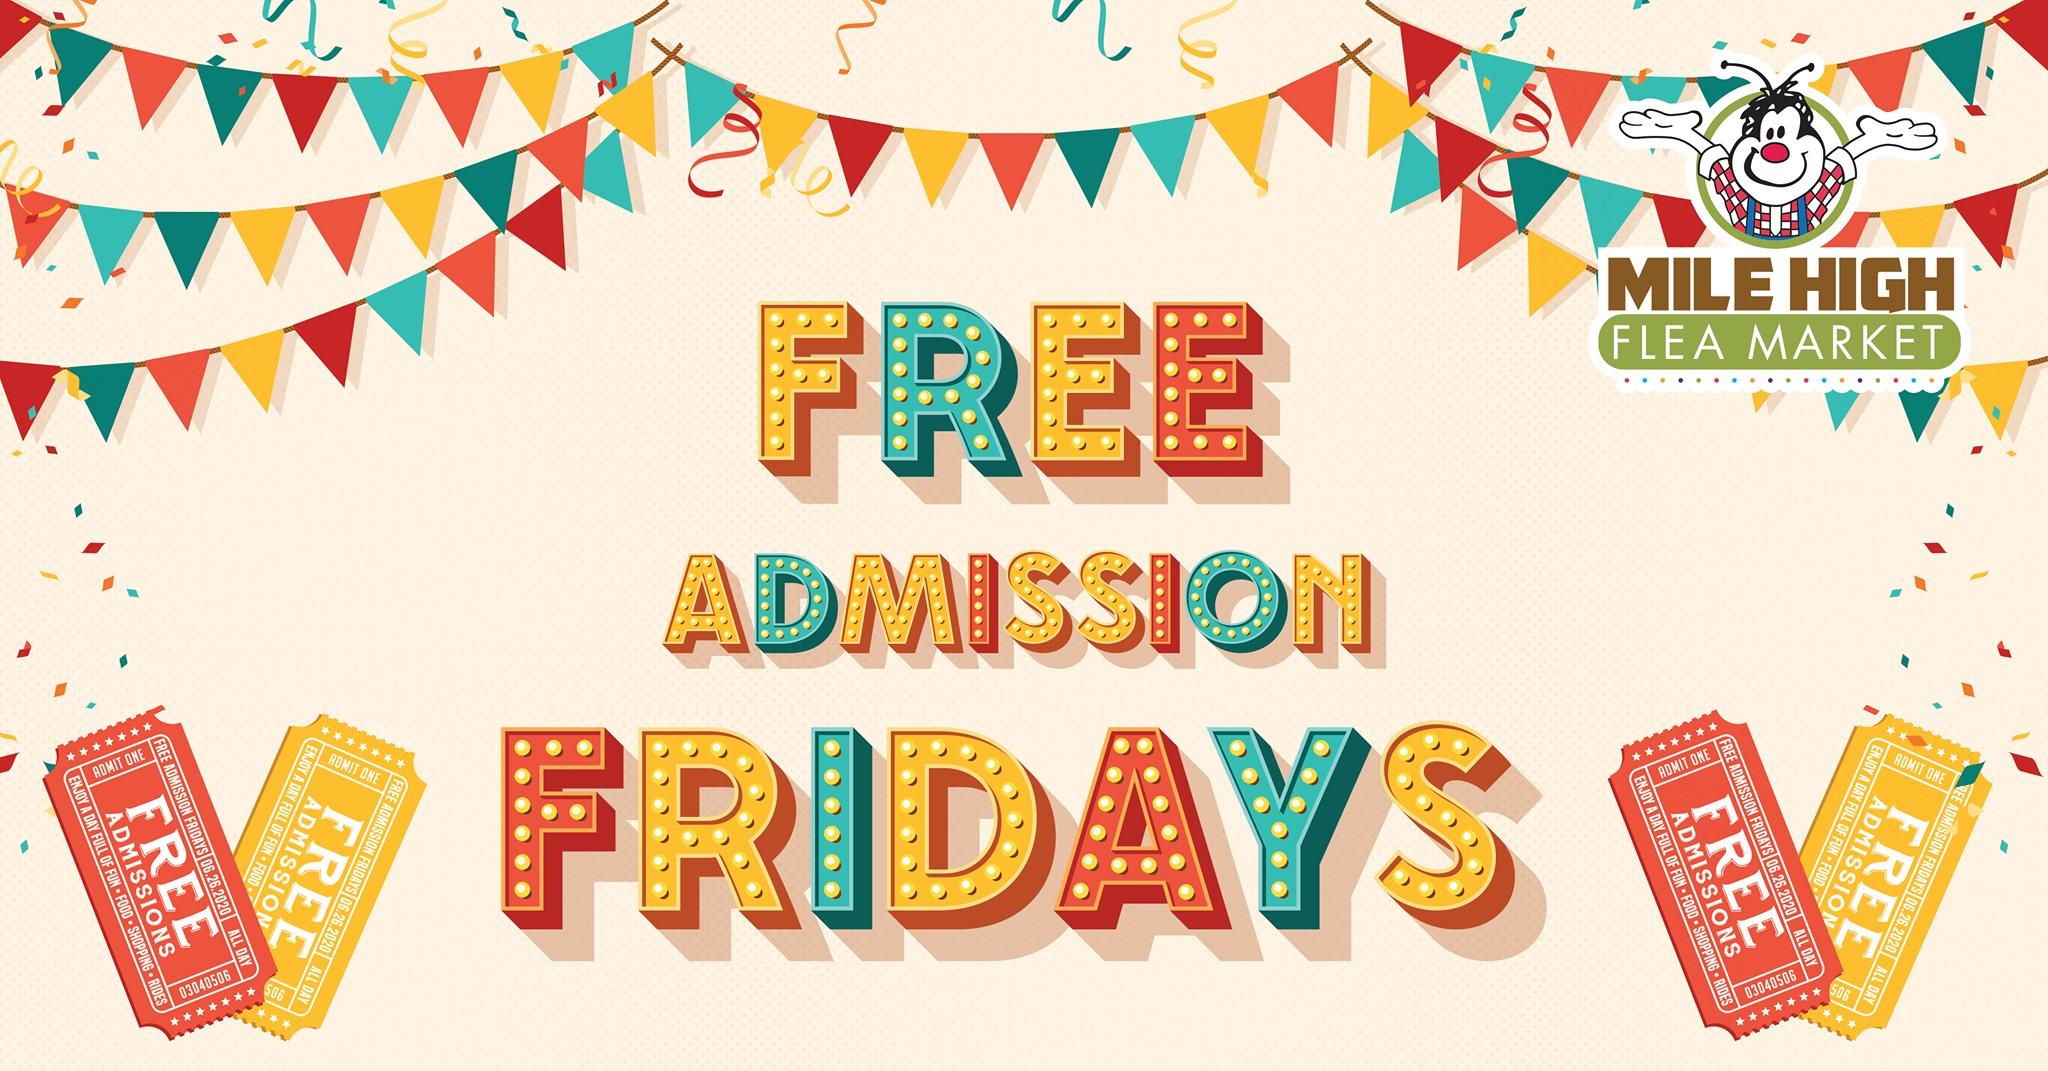 Free Admission Fridays at Mile High Flea Market